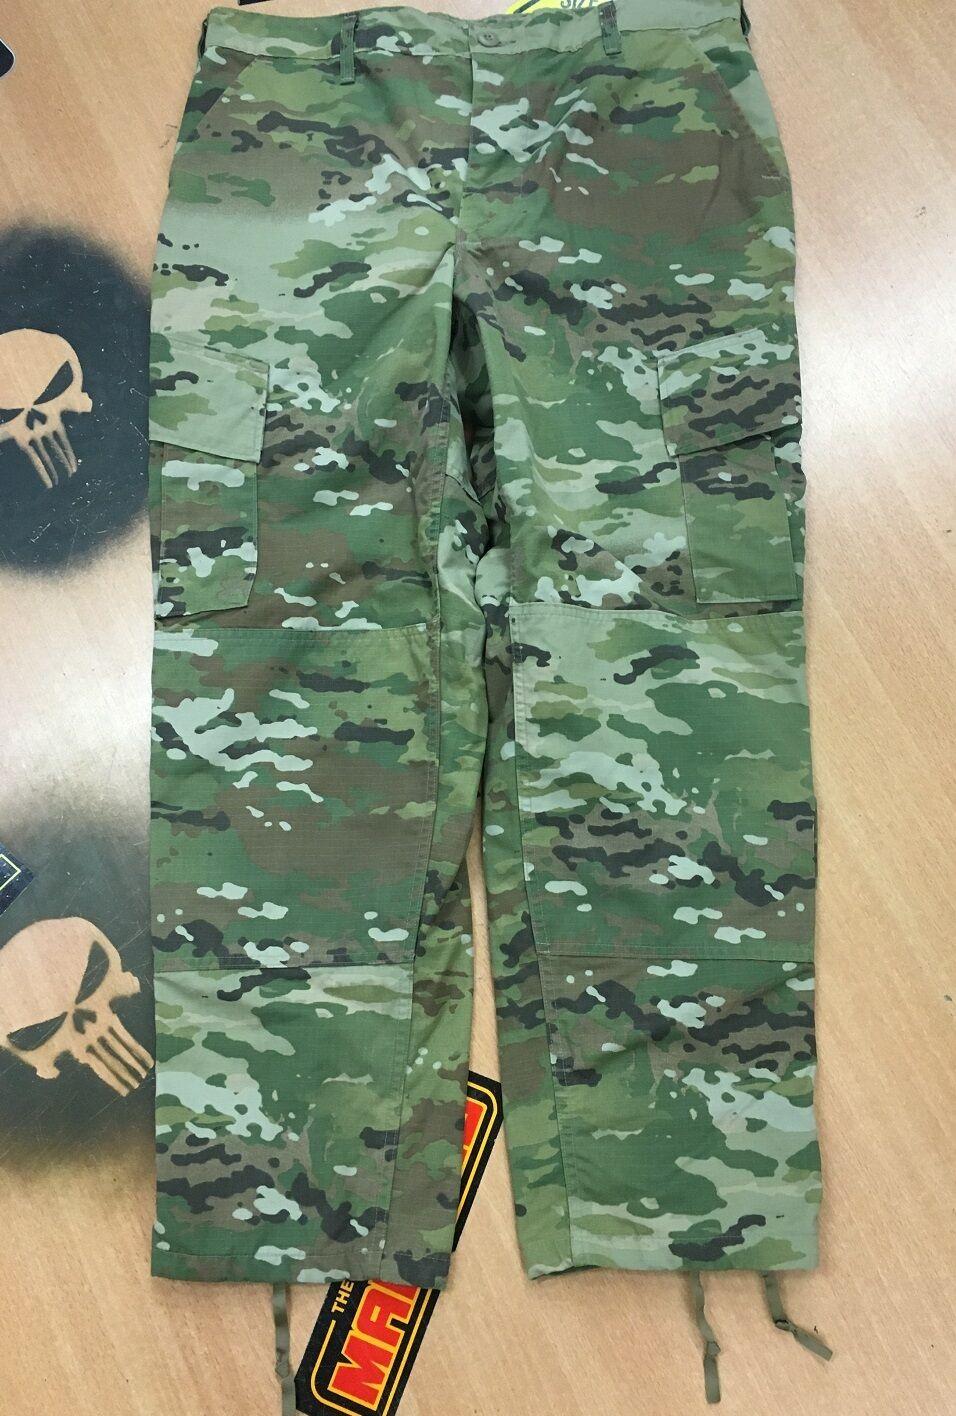 Us Army Ocp Acu Scorpion W2 Combat Uniform Camo Pants Trousers Longsleeve Large